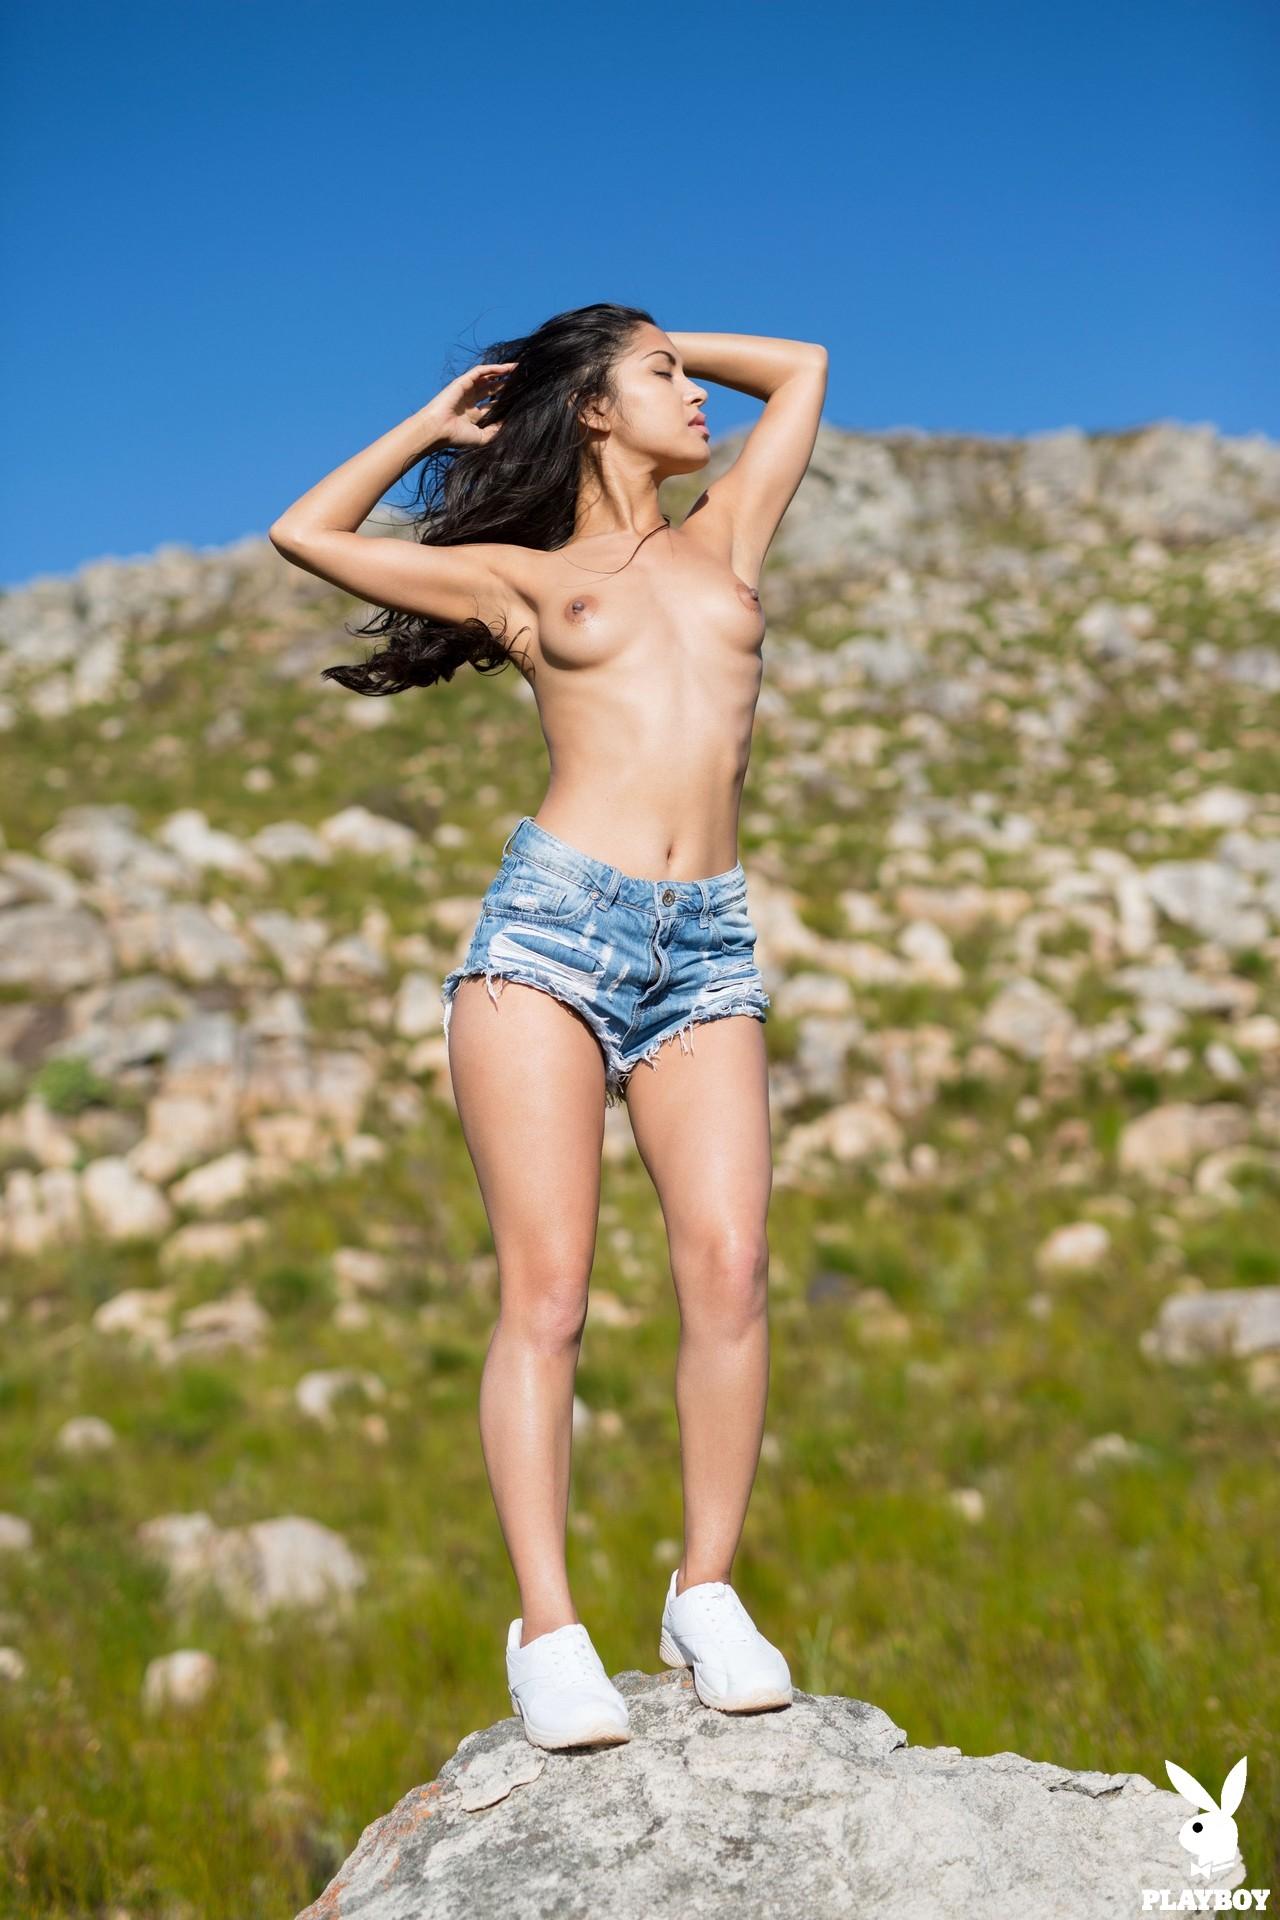 Chloe Rose in Trail Blazing 11